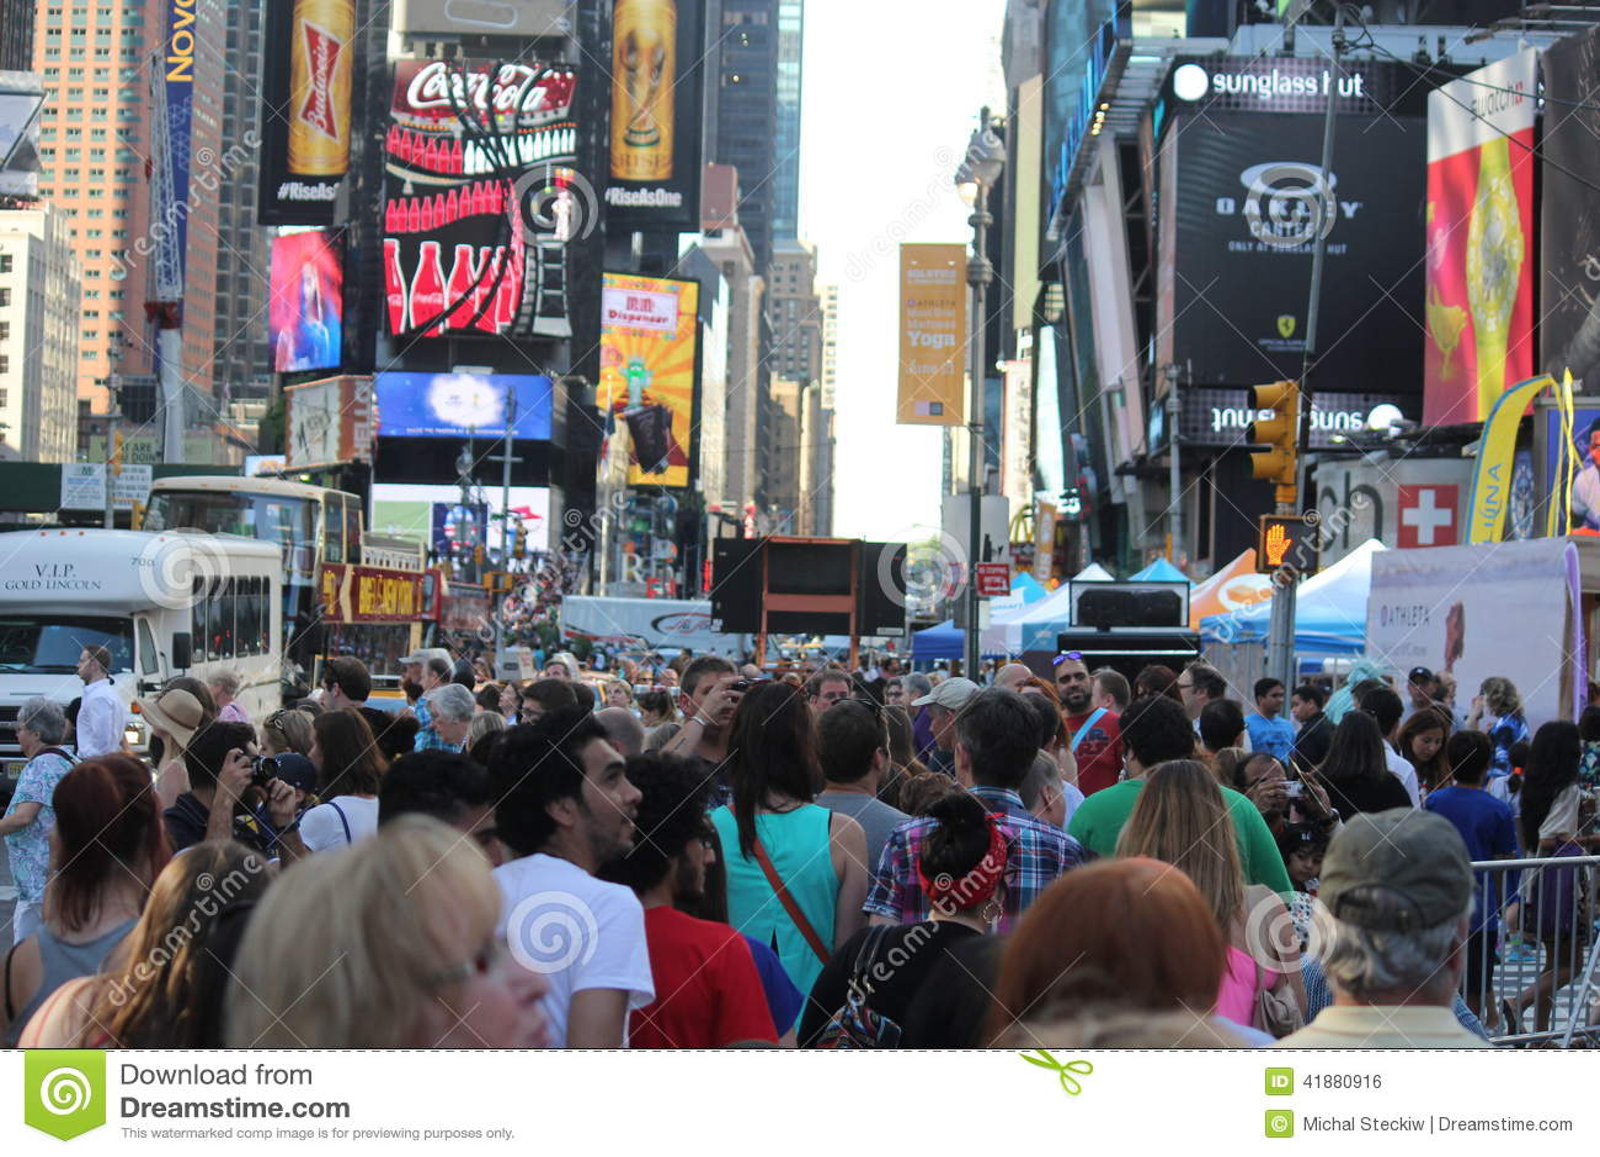 new york times shoppers meet your scorekeeper